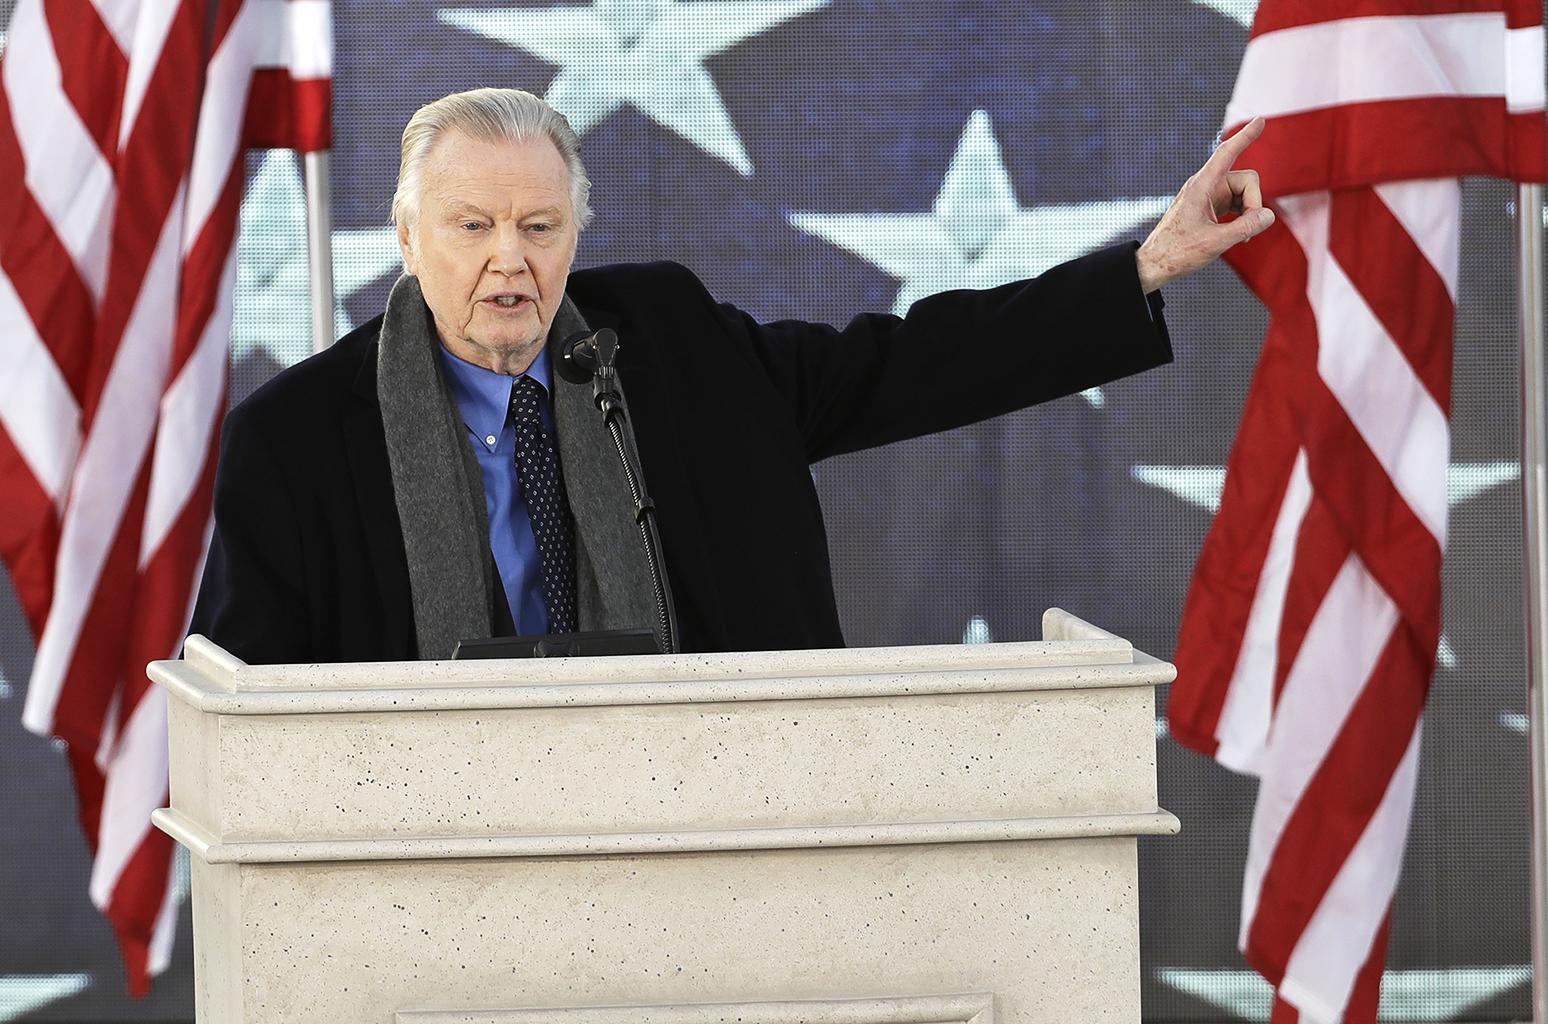 Inauguration 2017: Jon Voight Makes Speech at Donald Trump's 'Make America Great Again' Celebration | Billboard